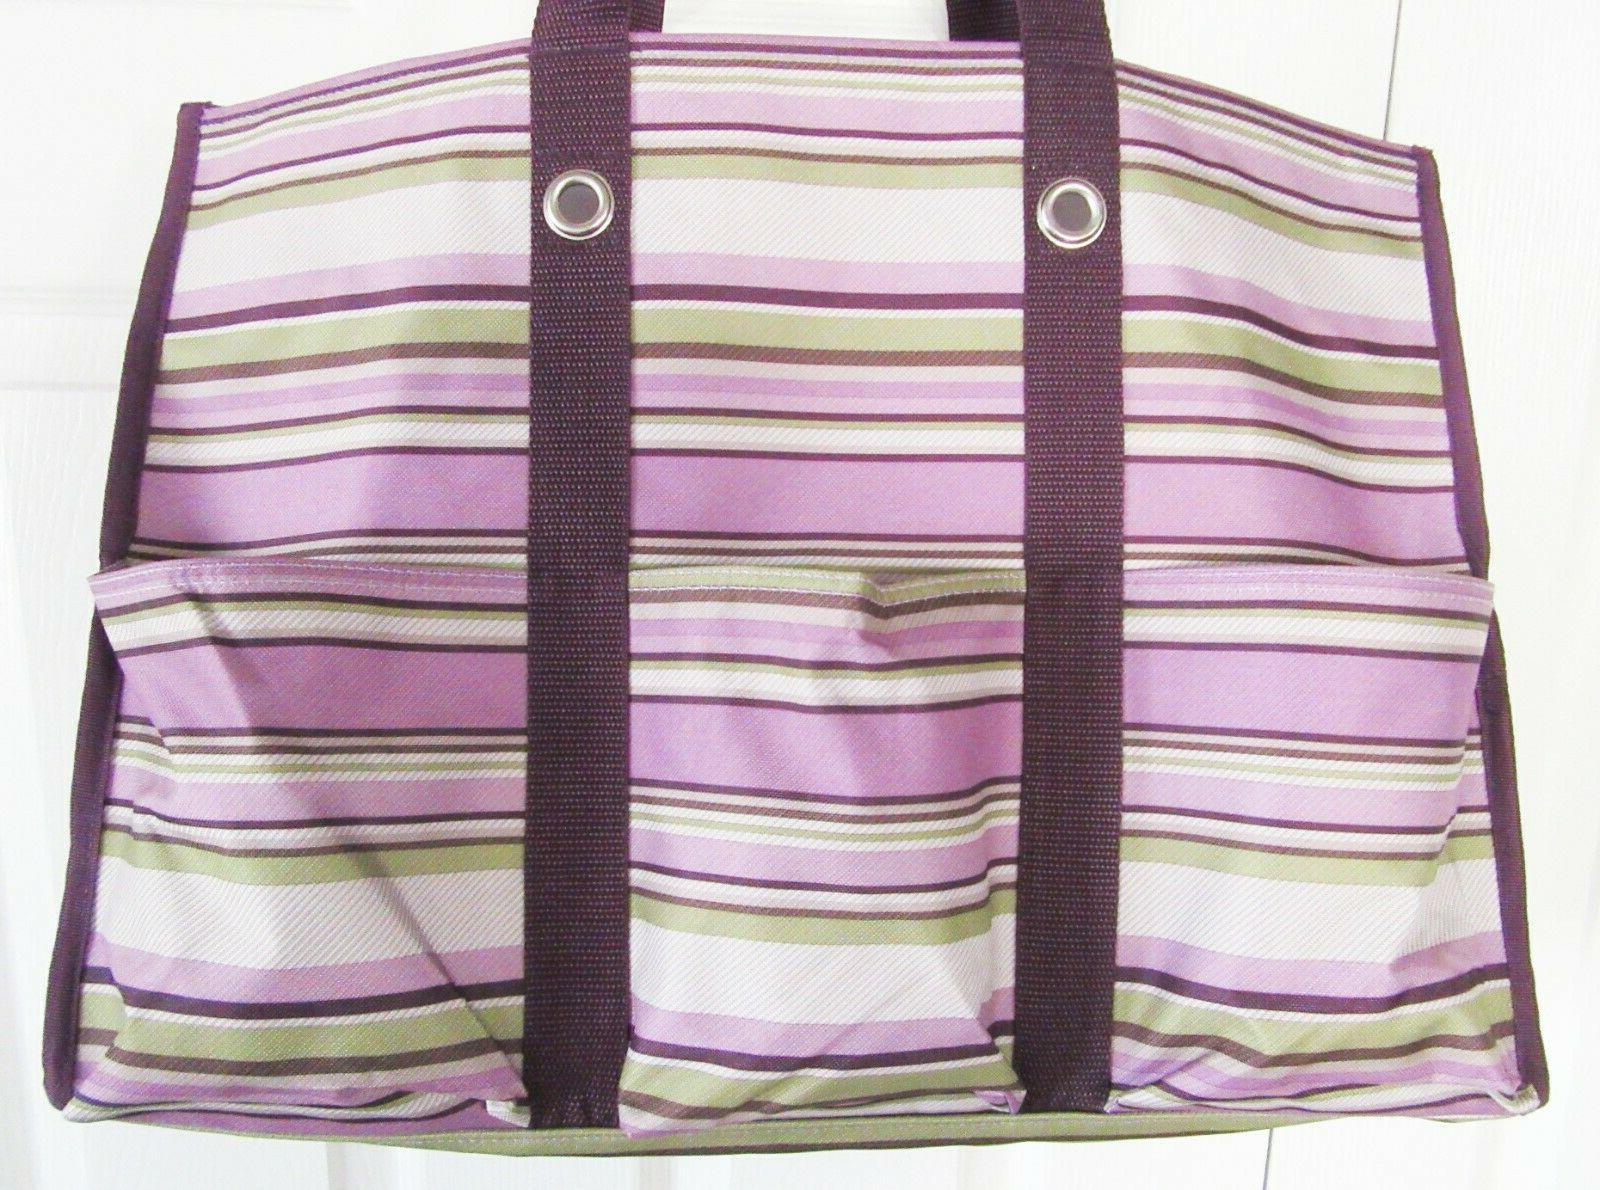 Thirty-one Organizing Utility Tote Bag